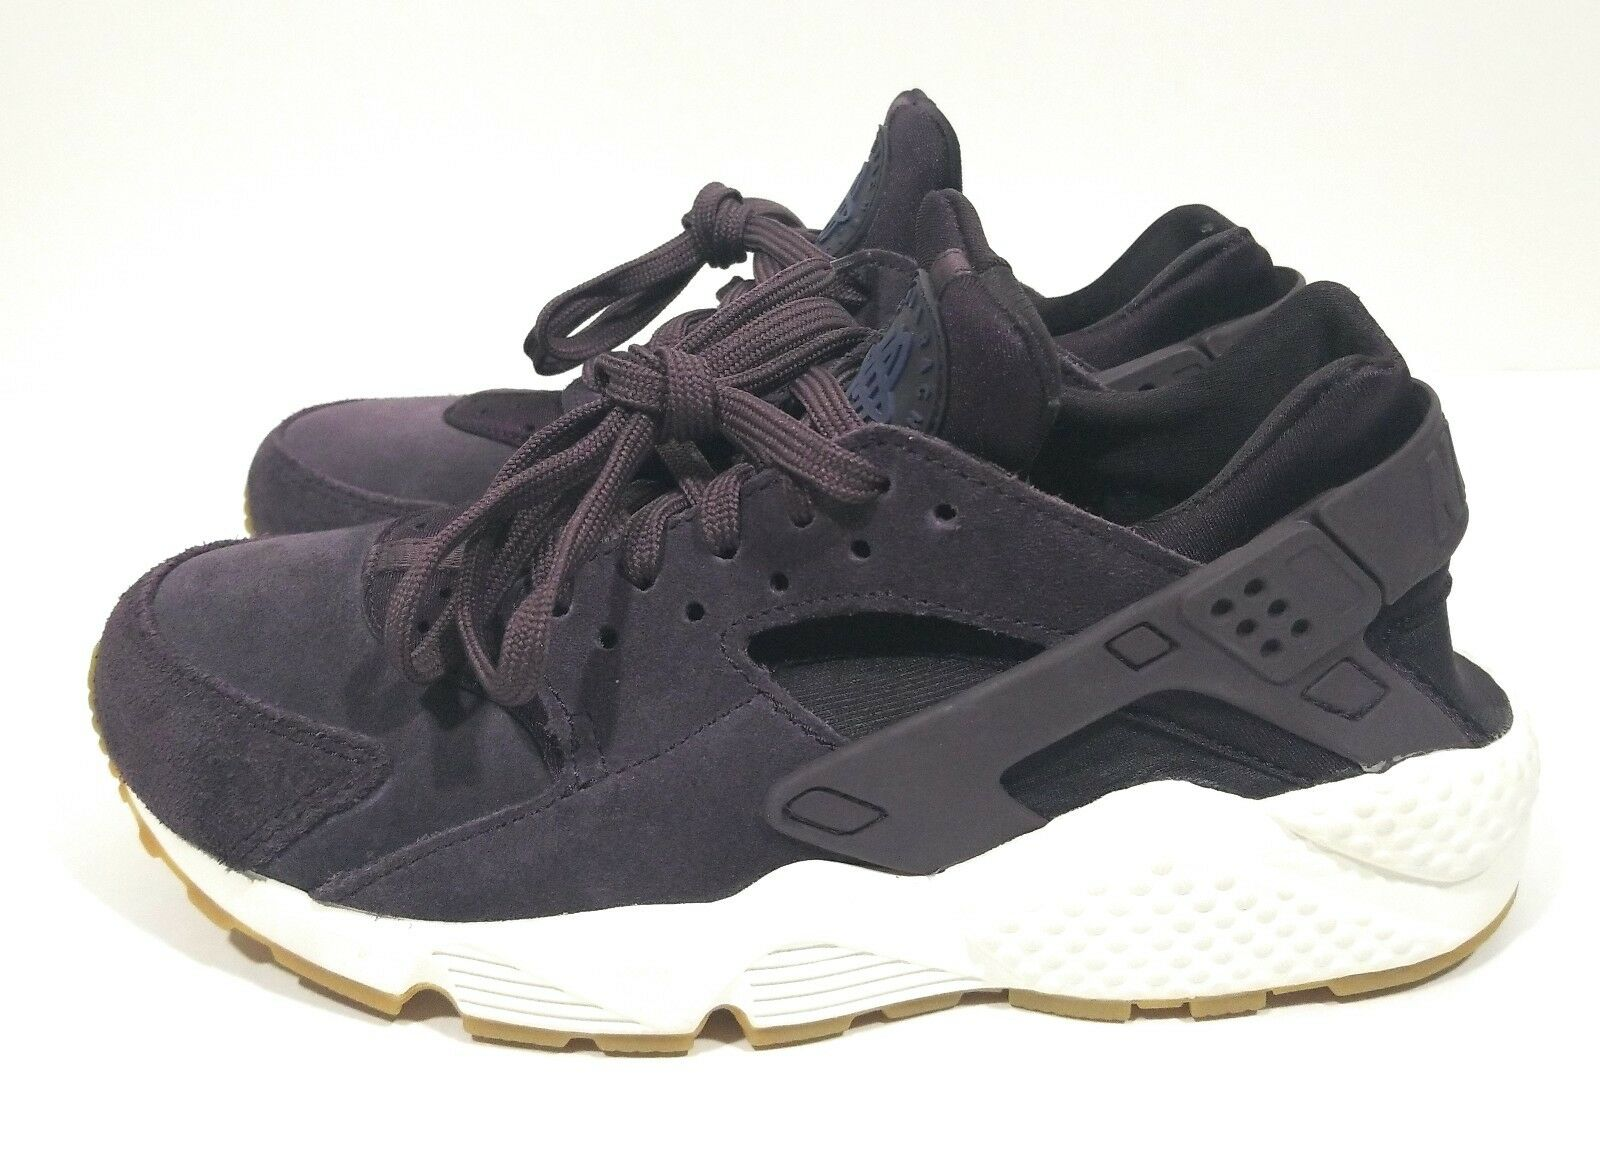 Nike Air Huarache Run SD Womens Running Training shoes Port Wine Size 7.5